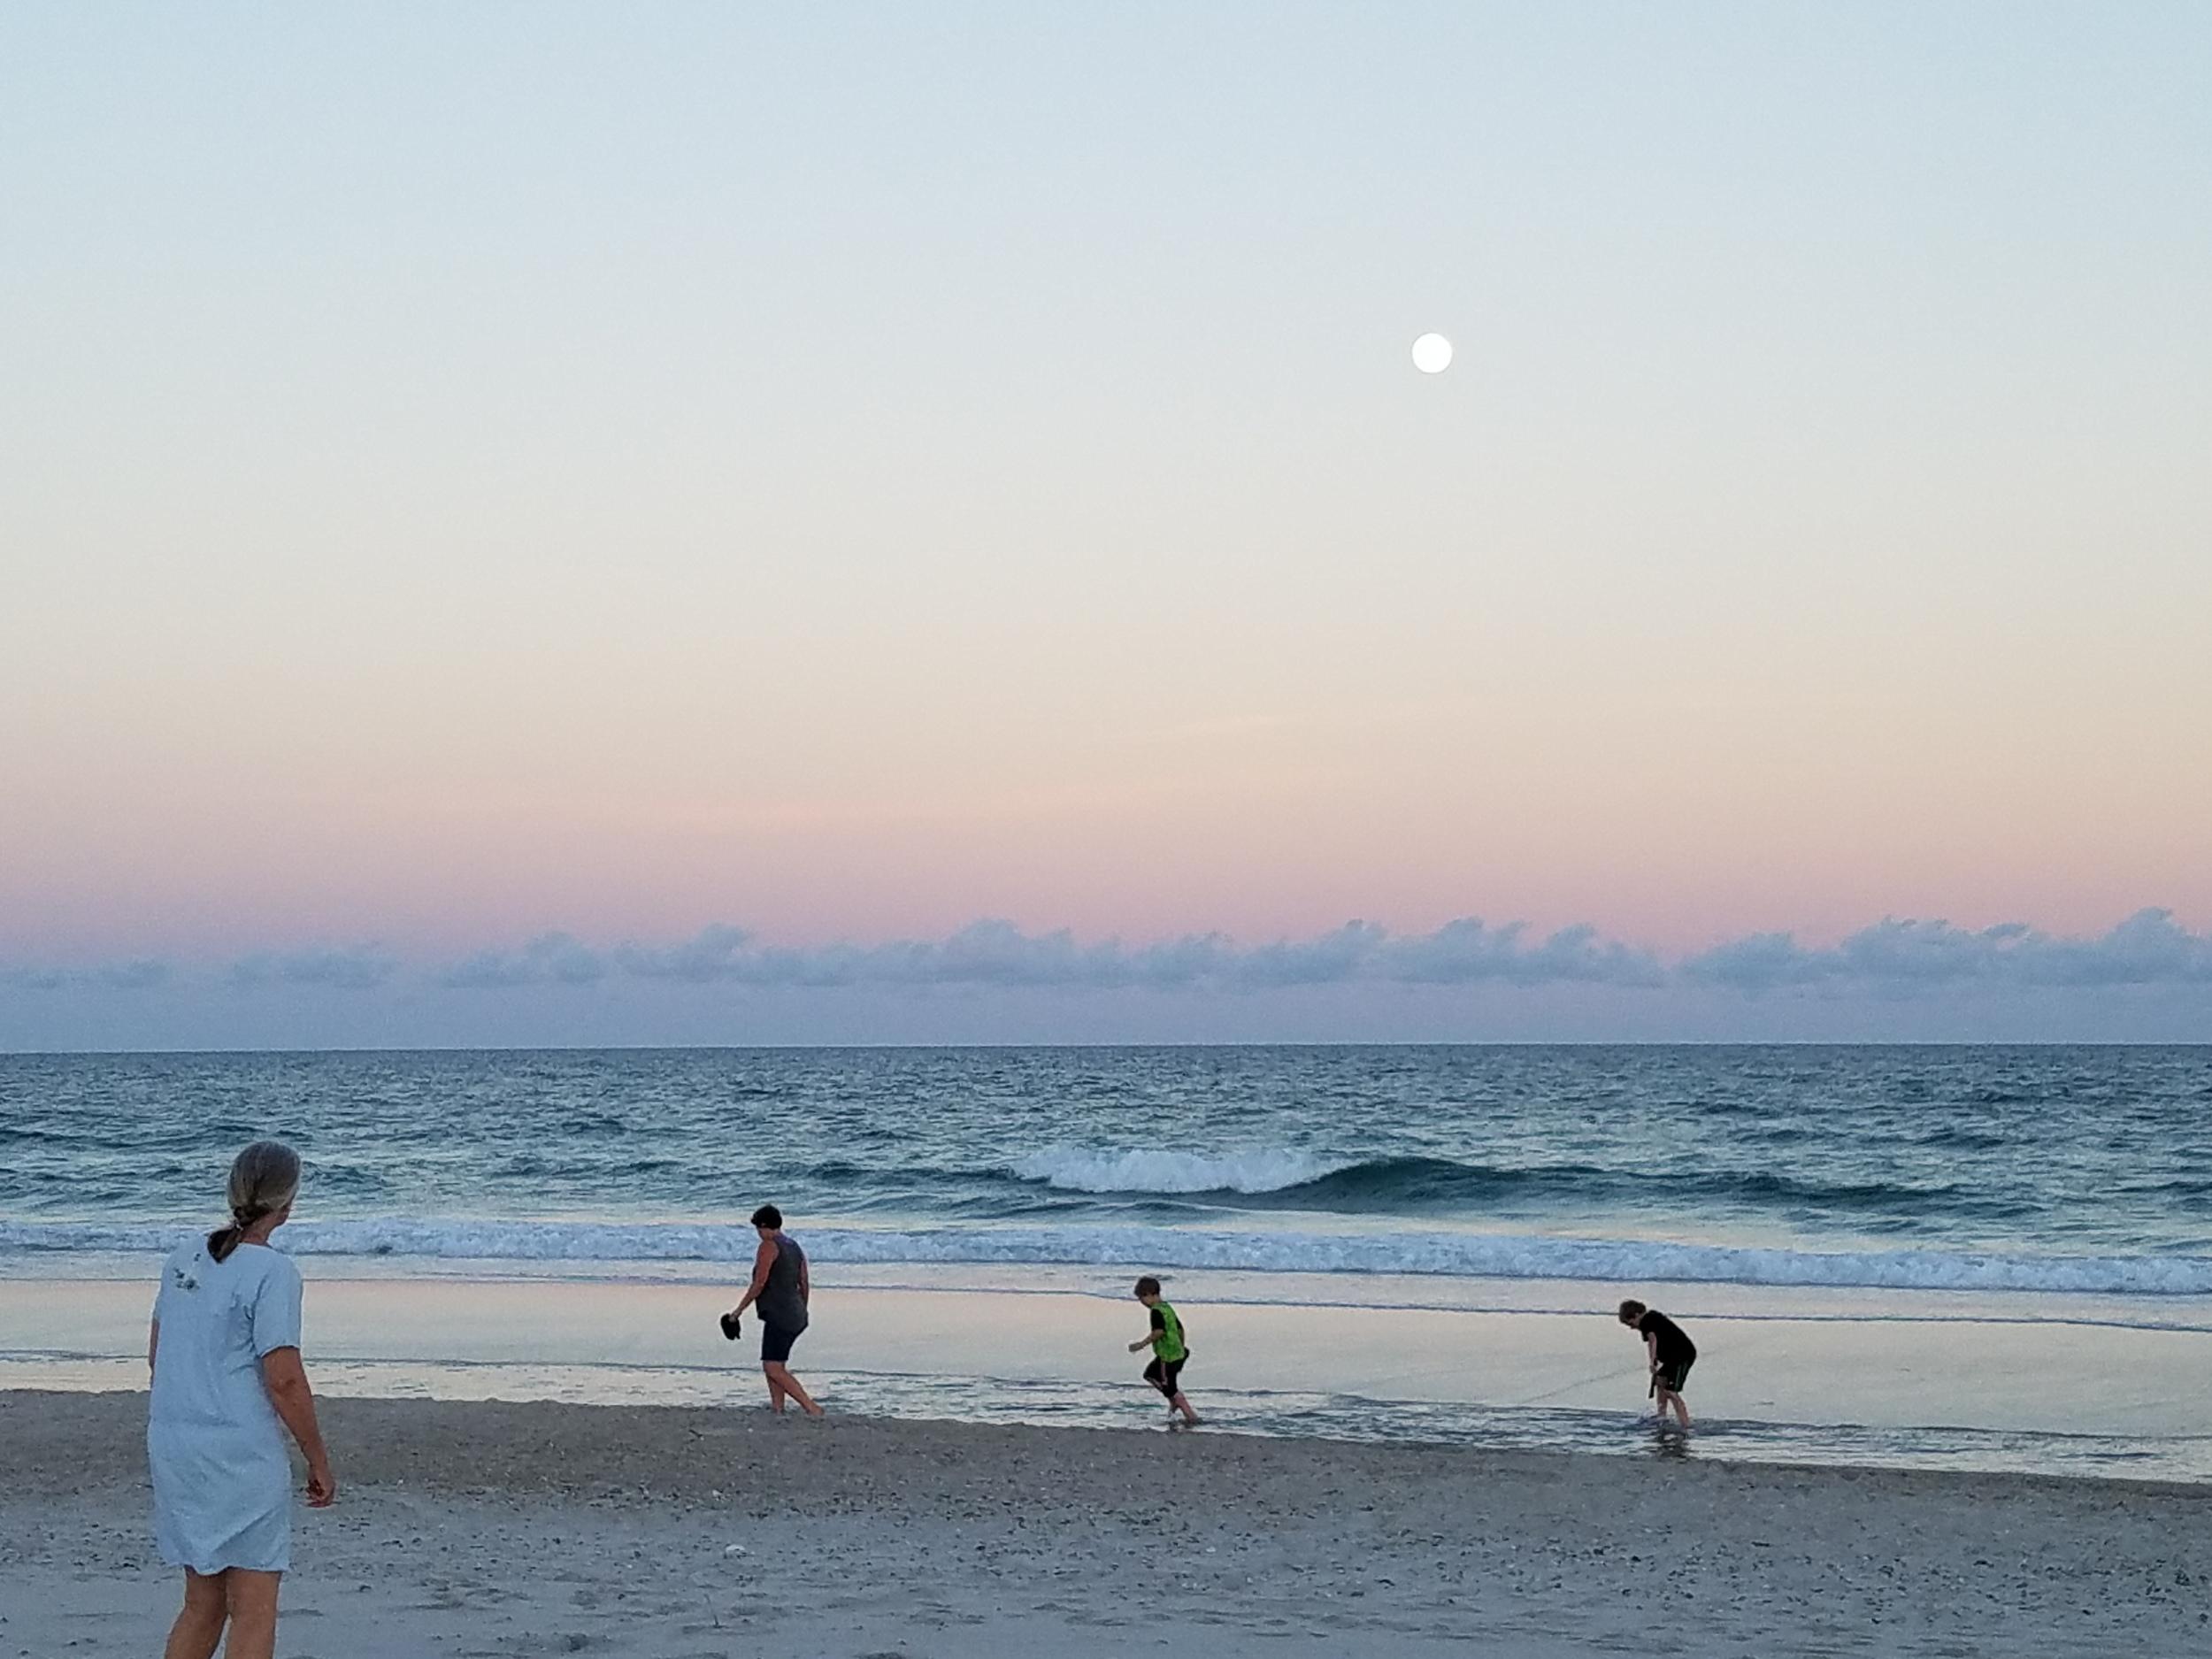 evening beach walk July 18 2016.jpg